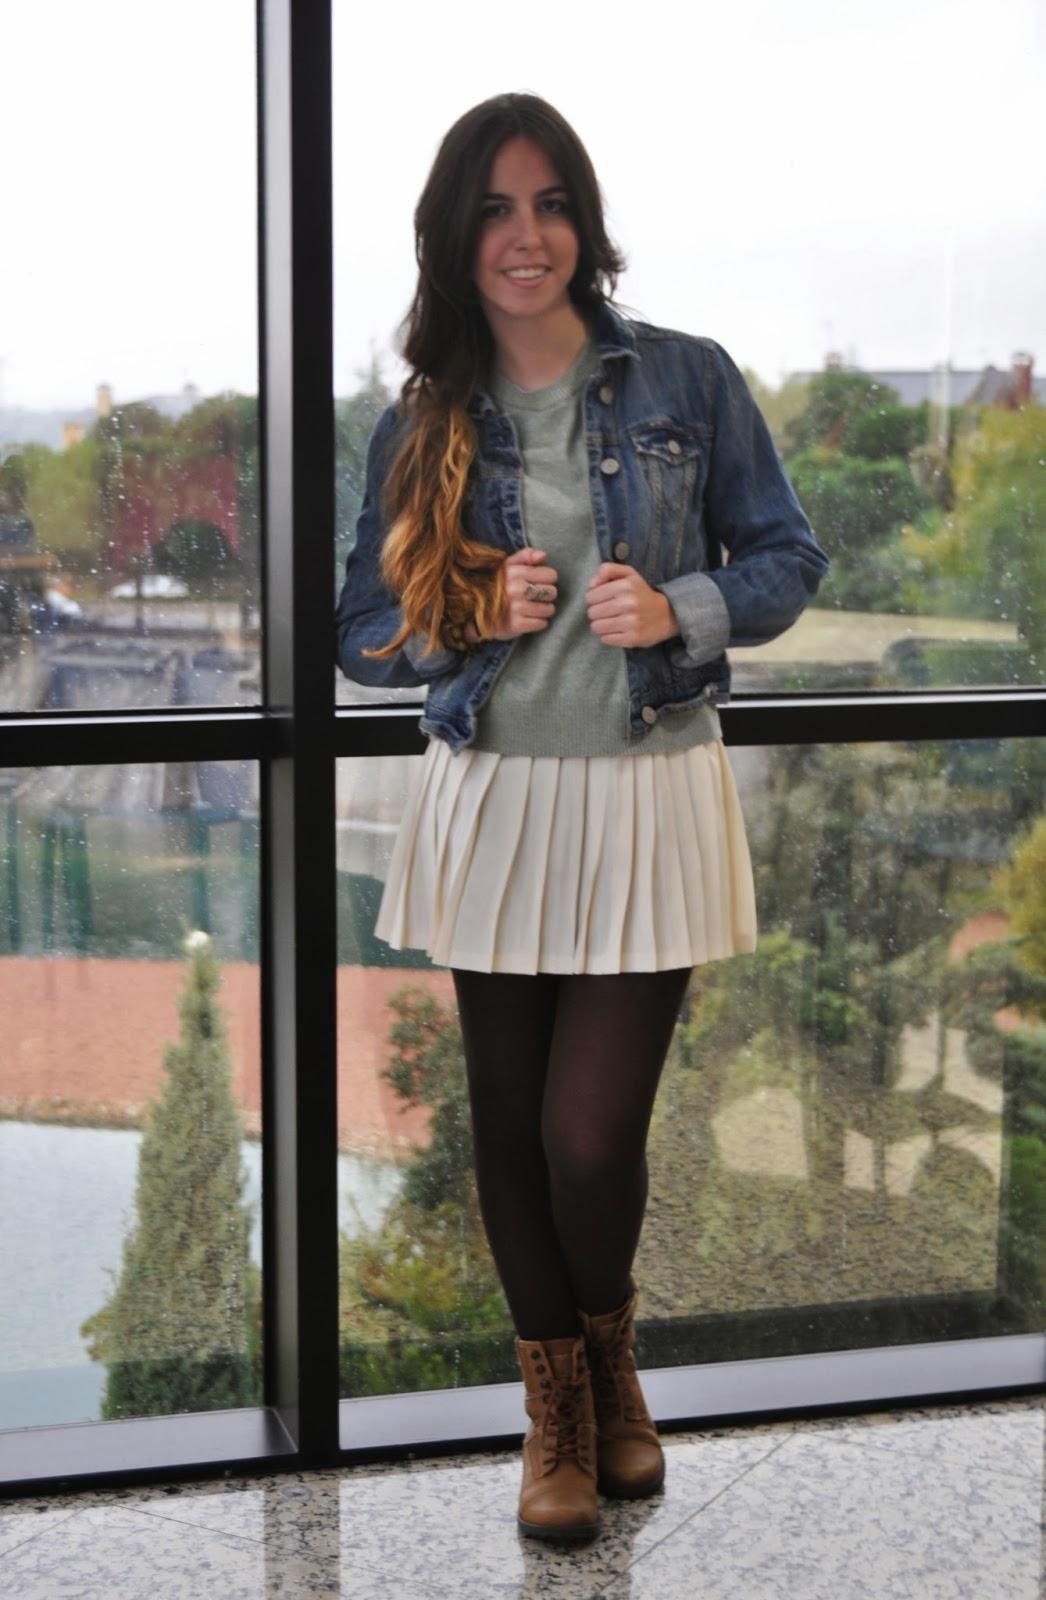 hey vicky hey, victoria suarez, autumn, otoño, girl, fashion blog, blogger, madrid, uem